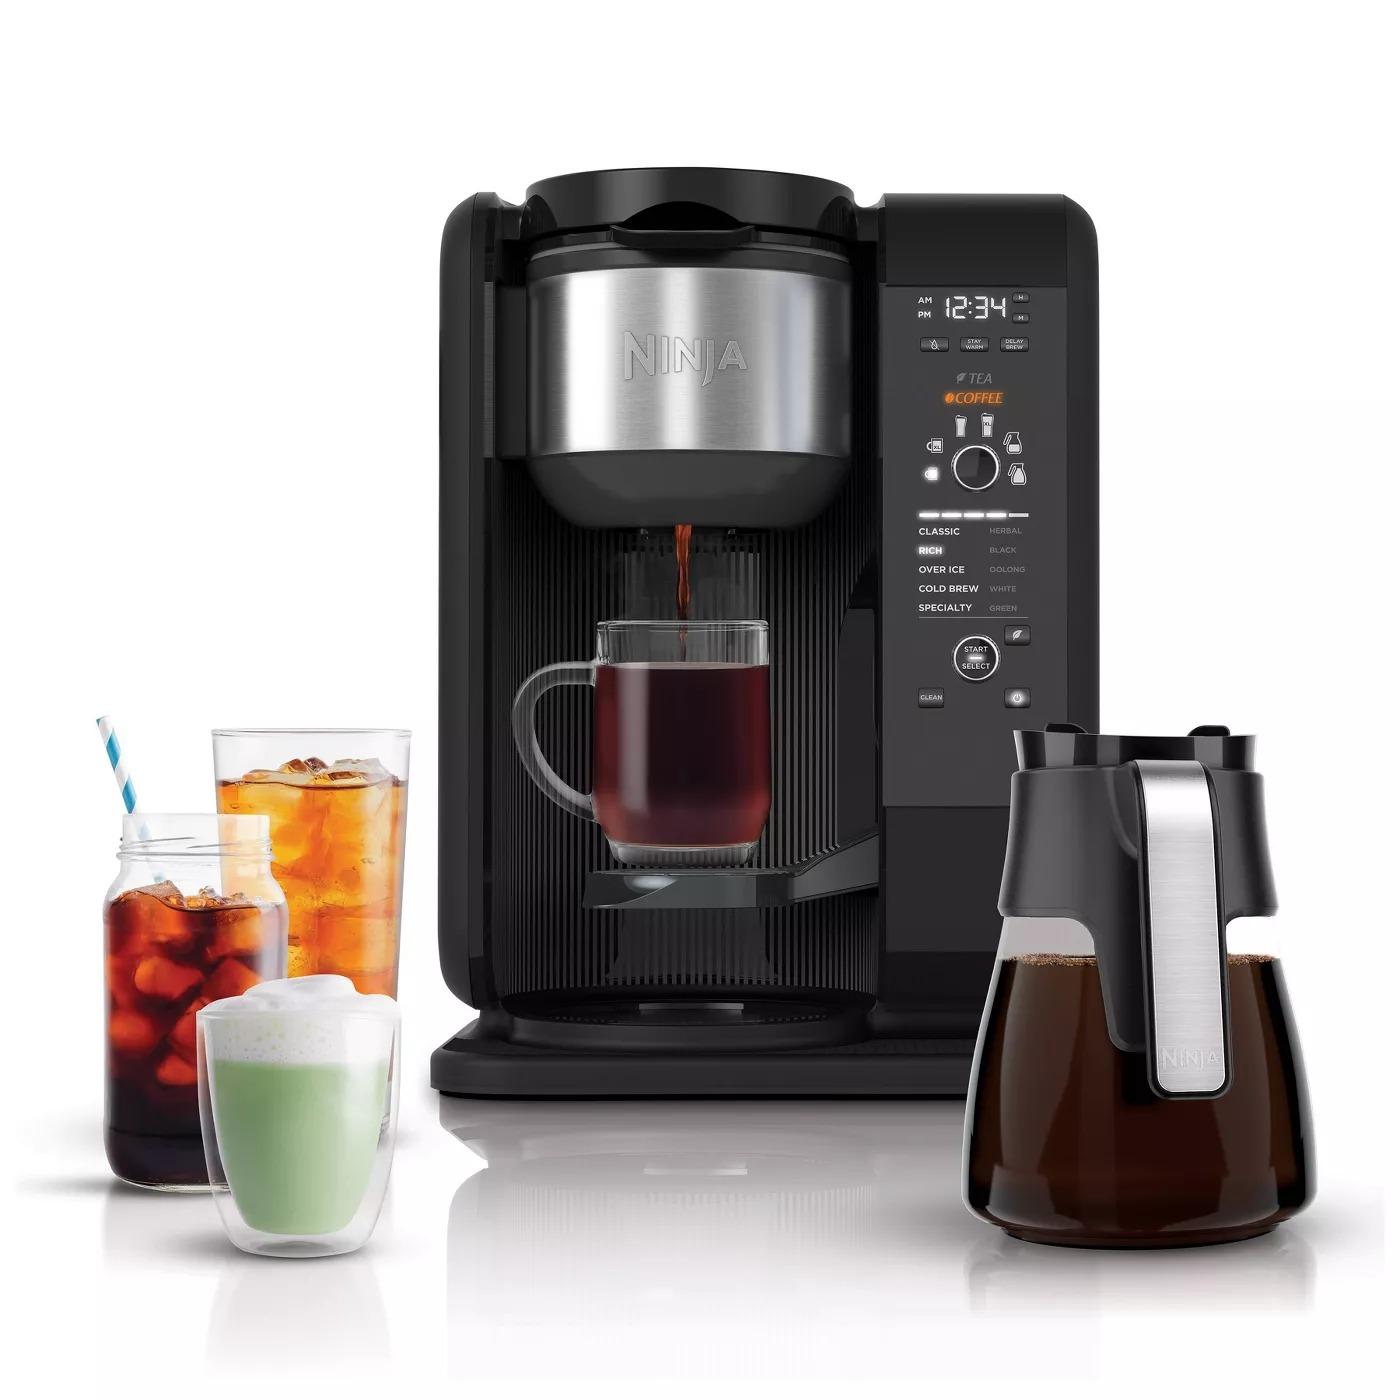 Ninja Hot & Cold Brew Coffee Maker